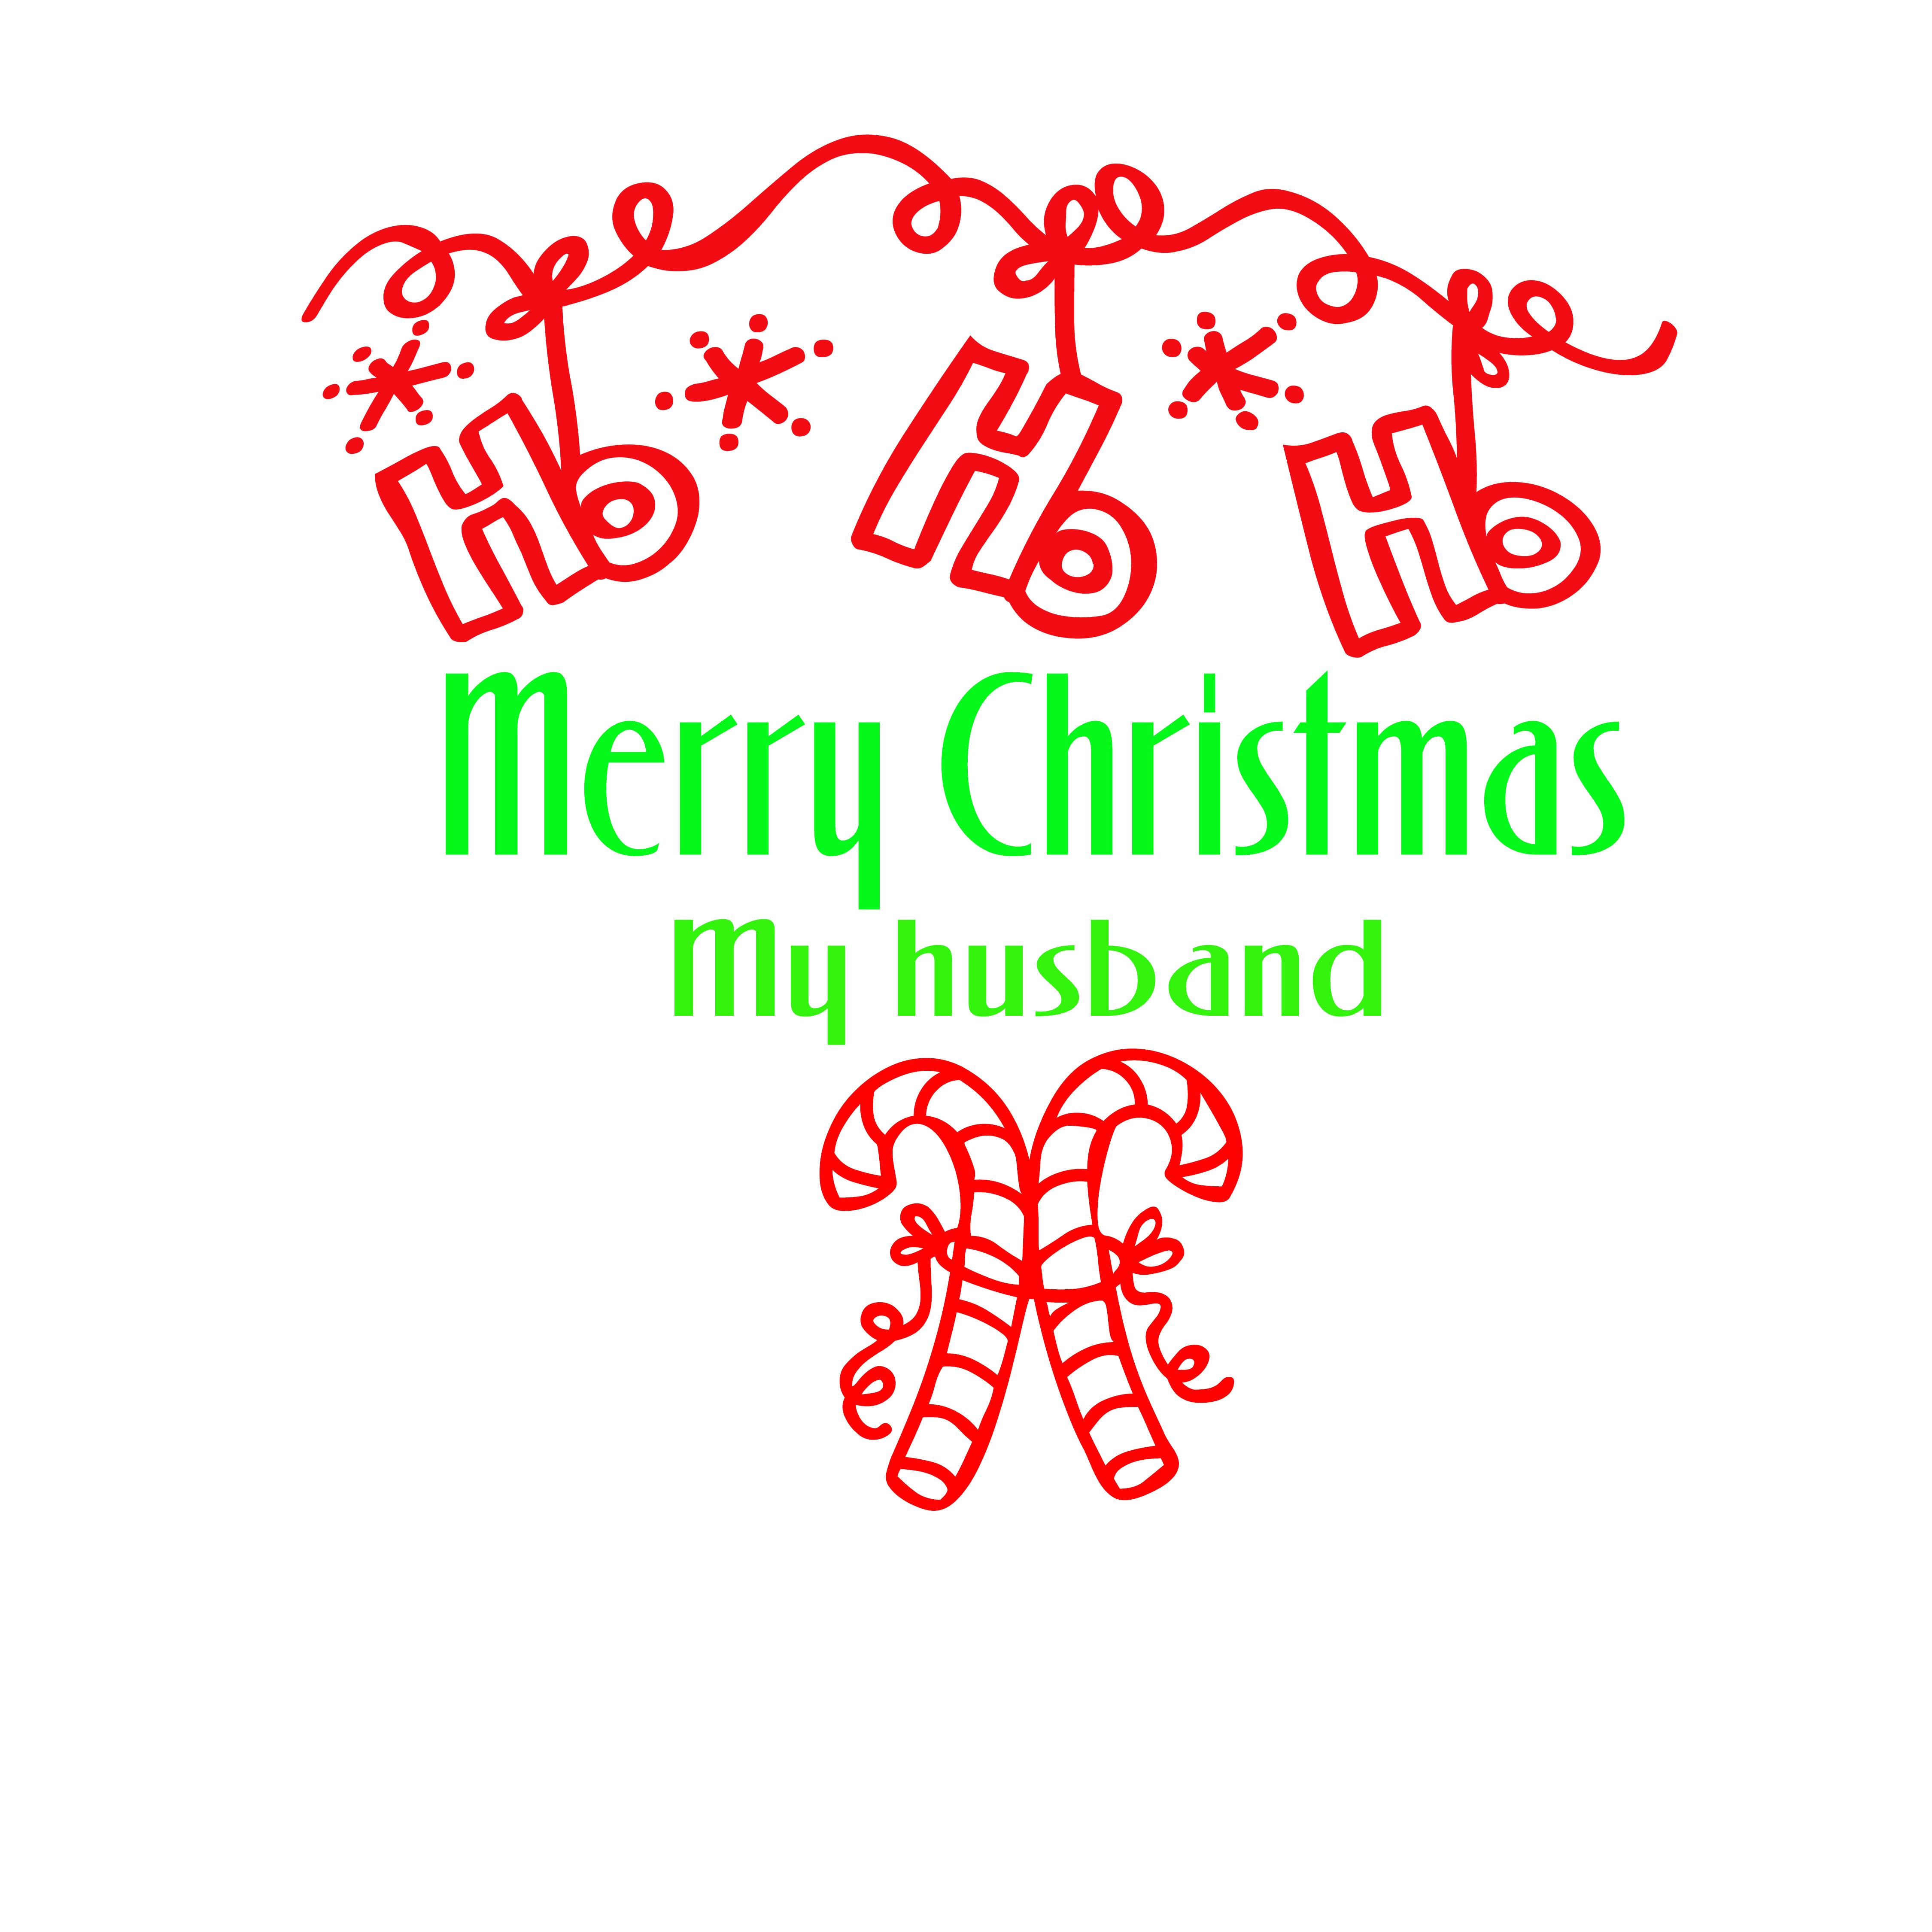 Merry Christmas my husband holiday t-shirt cotton men\'s tee white ...